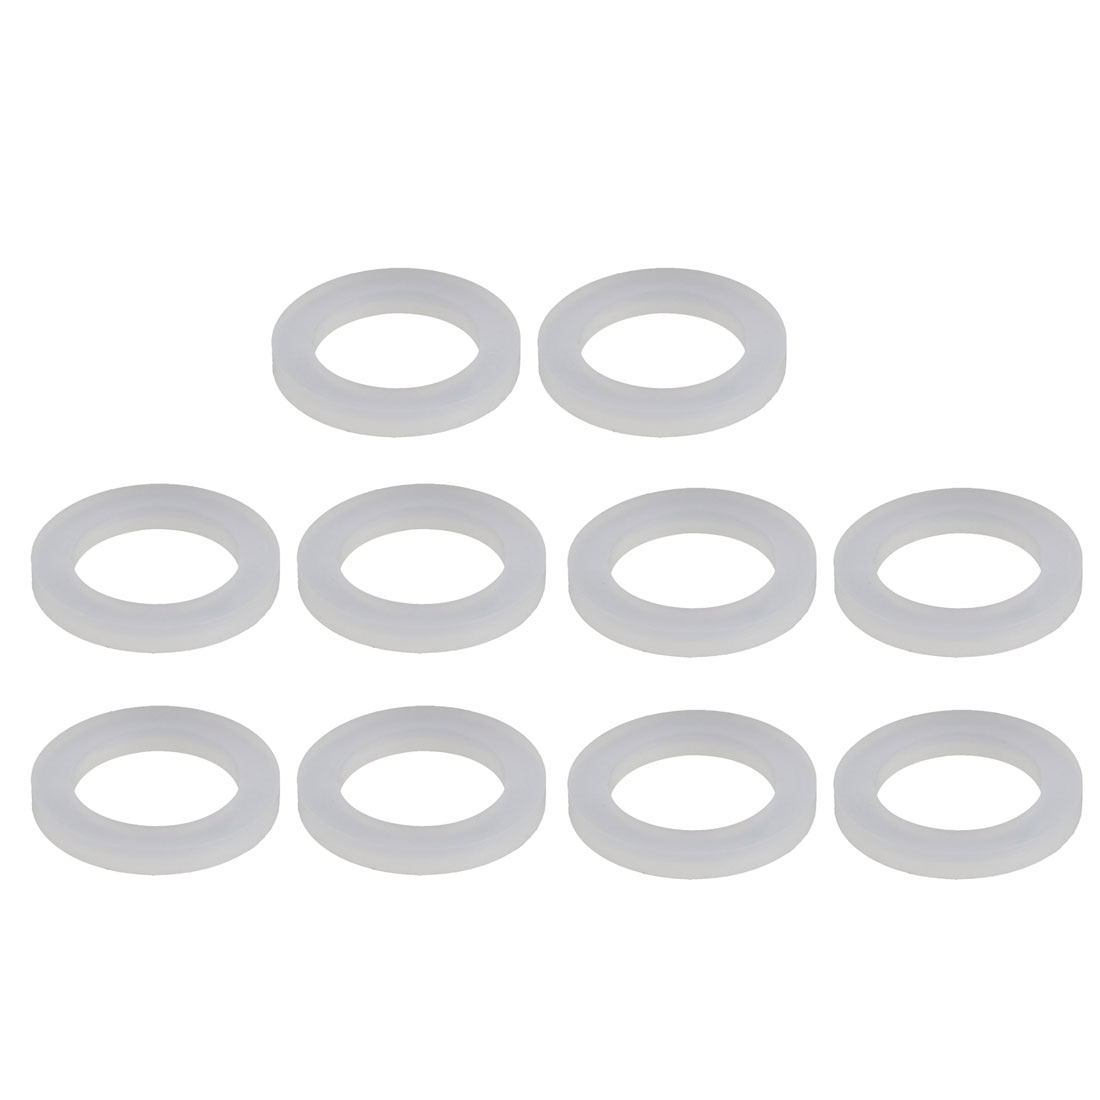 10pcs White Silica Gel Round Flat Washer Assortment Size 16x24x3mm Flat Washer